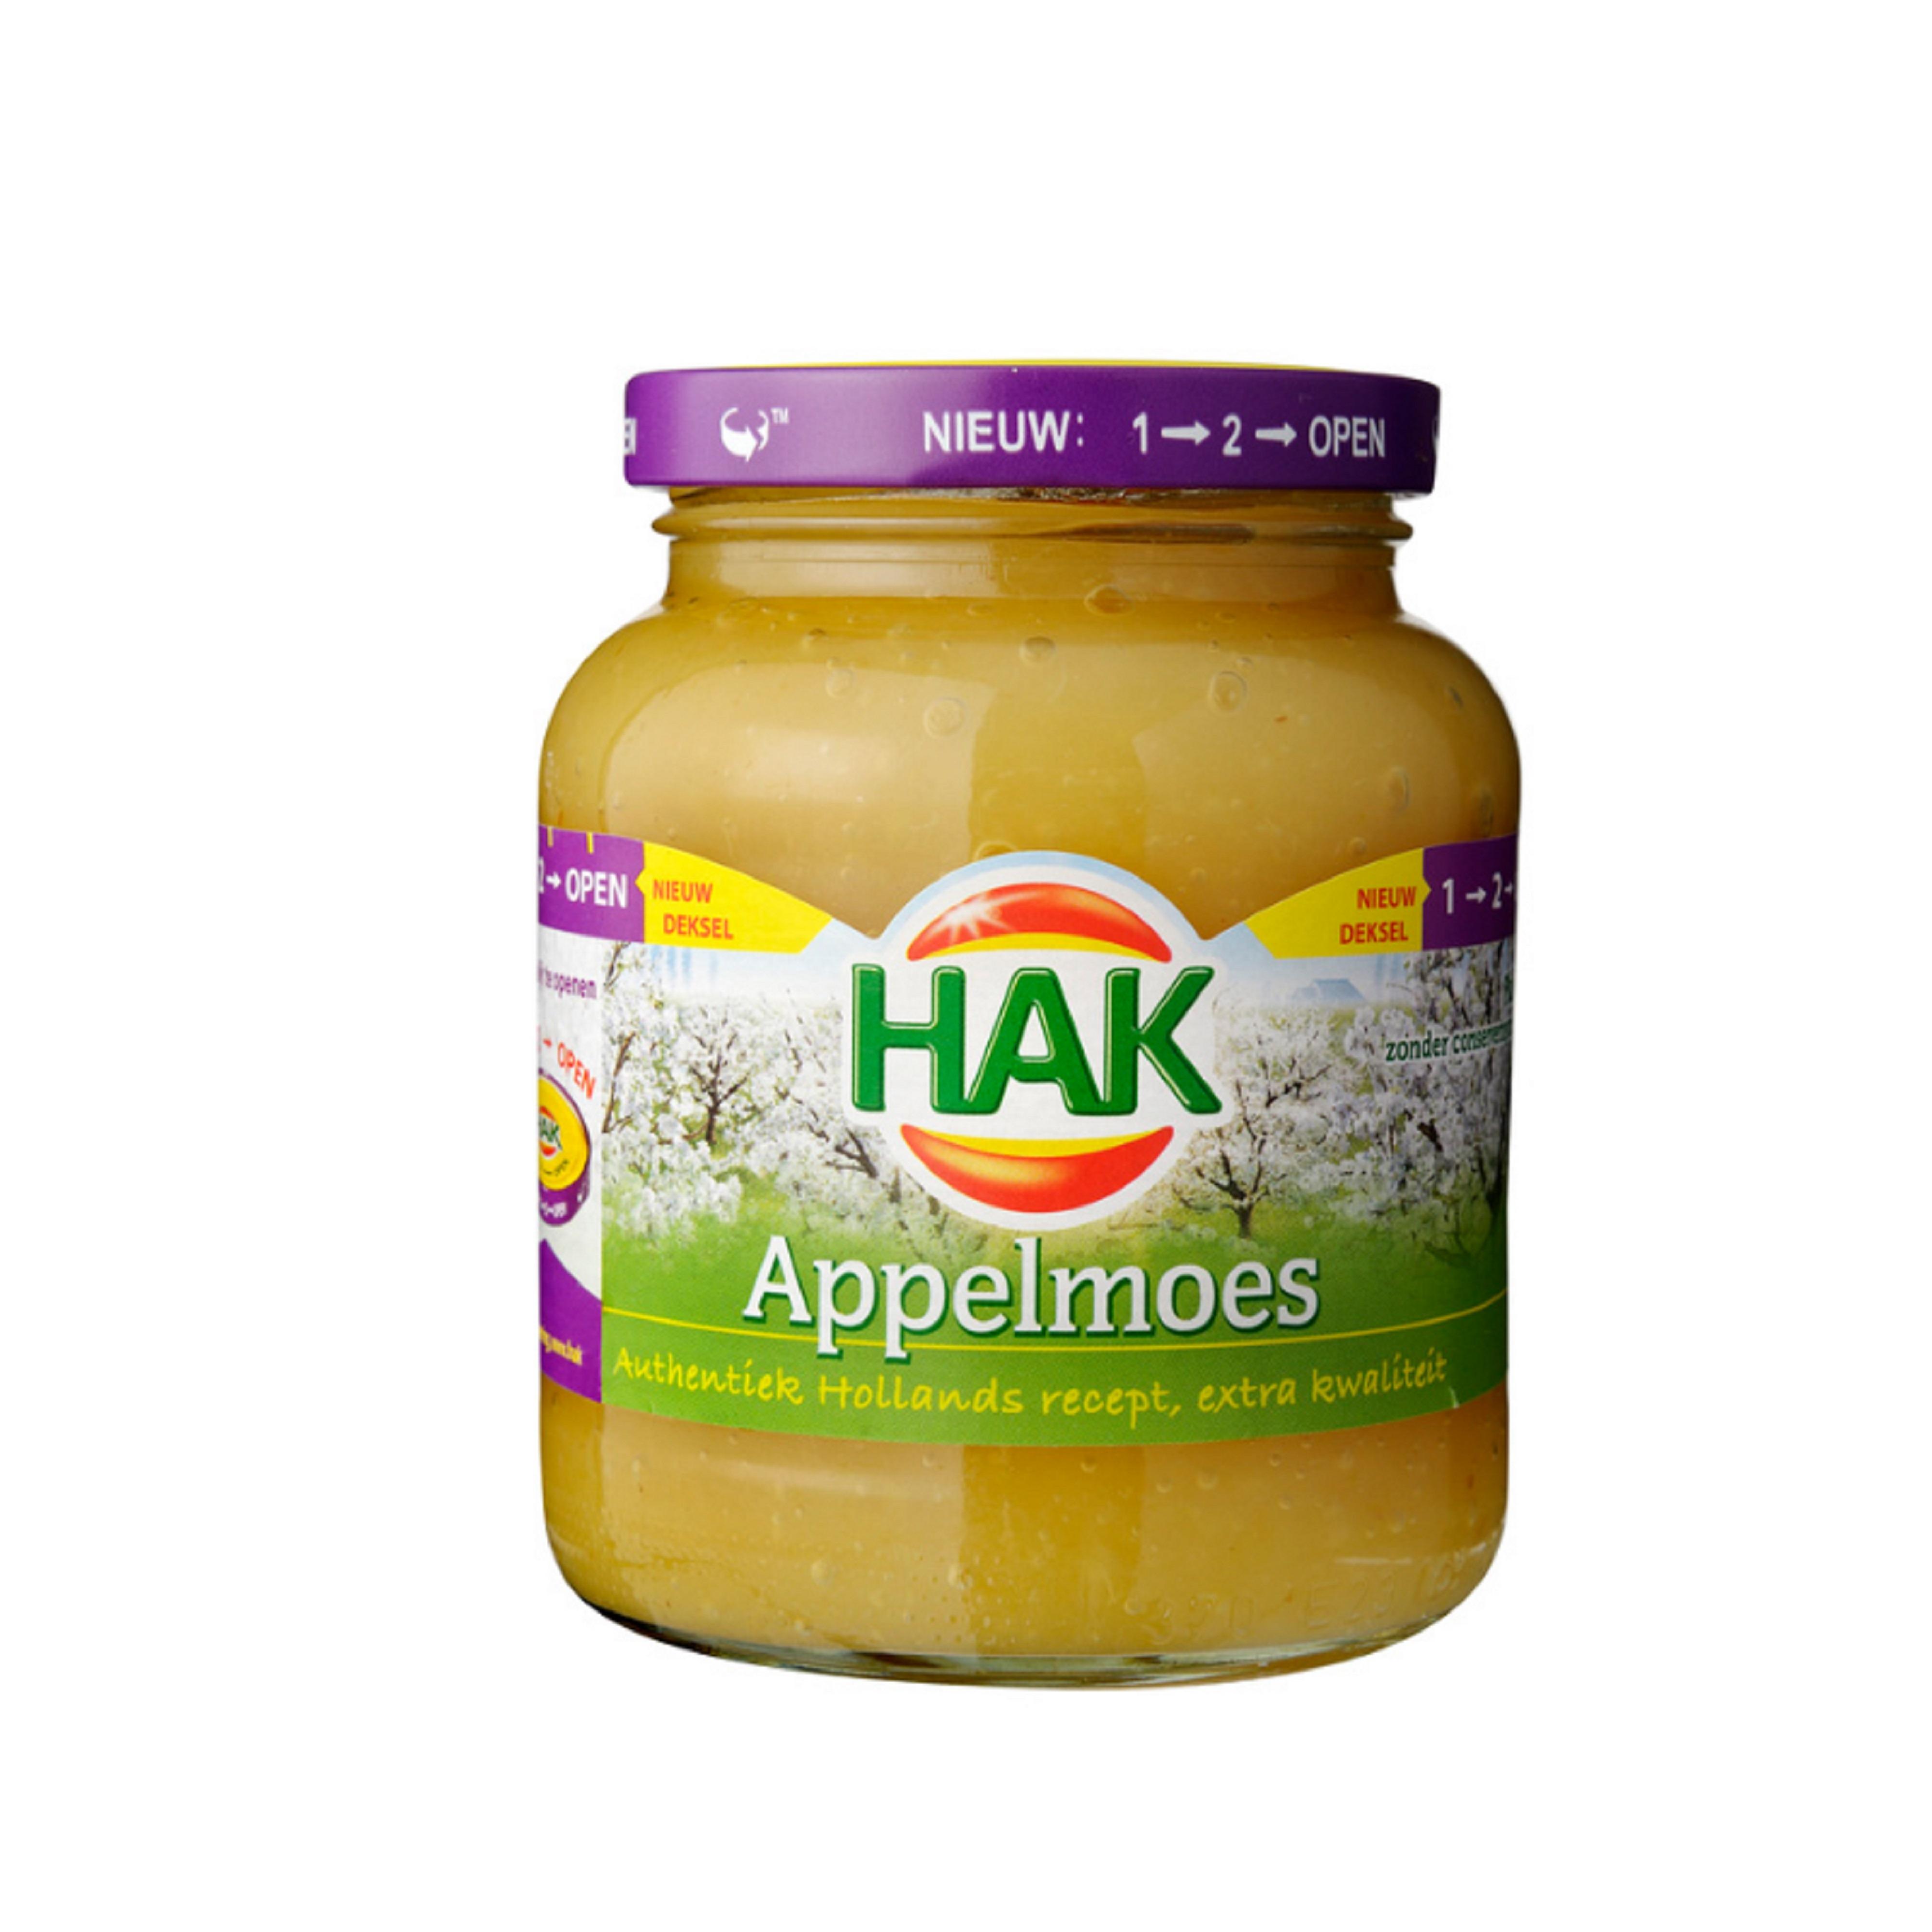 HAK Appelmoes